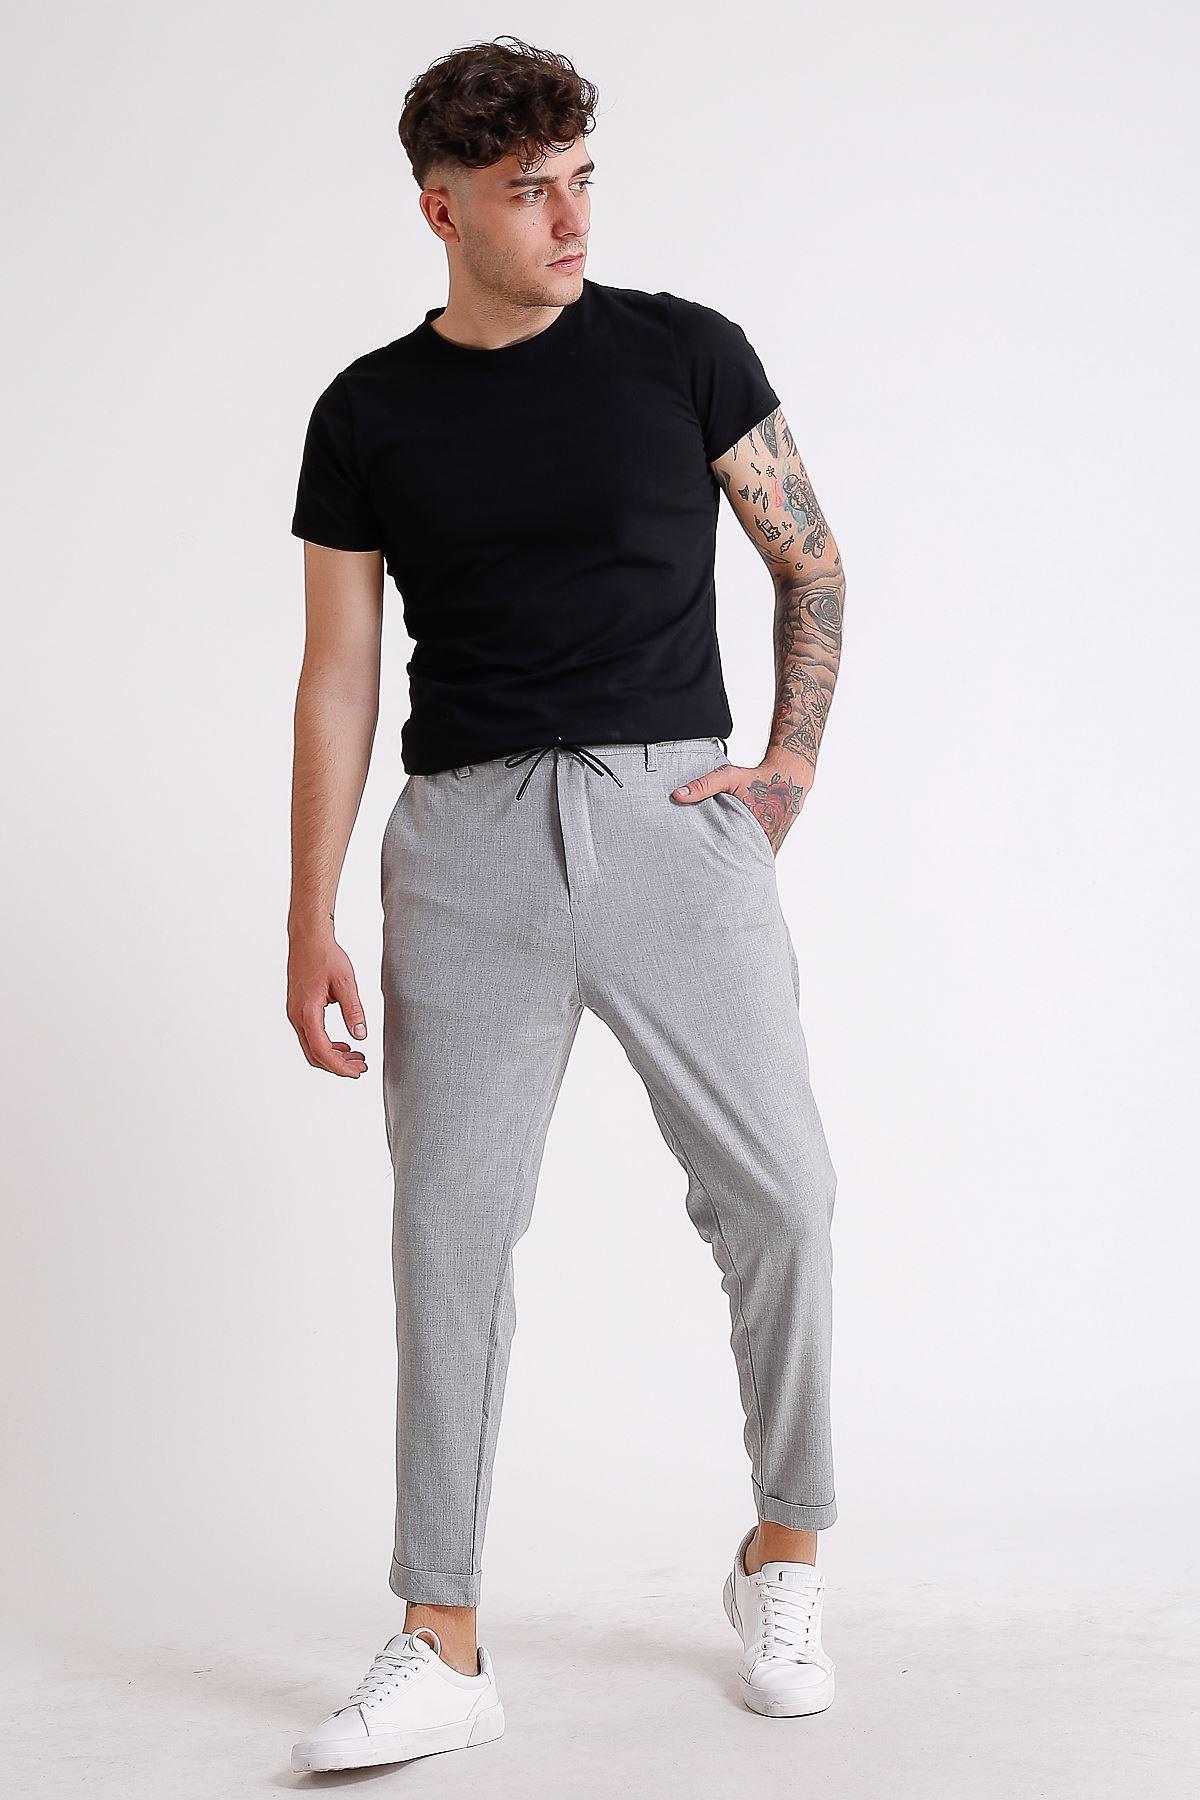 Erkek Beli Lastikli ve İpli Duble paçalı Gri Jogger Pantolon